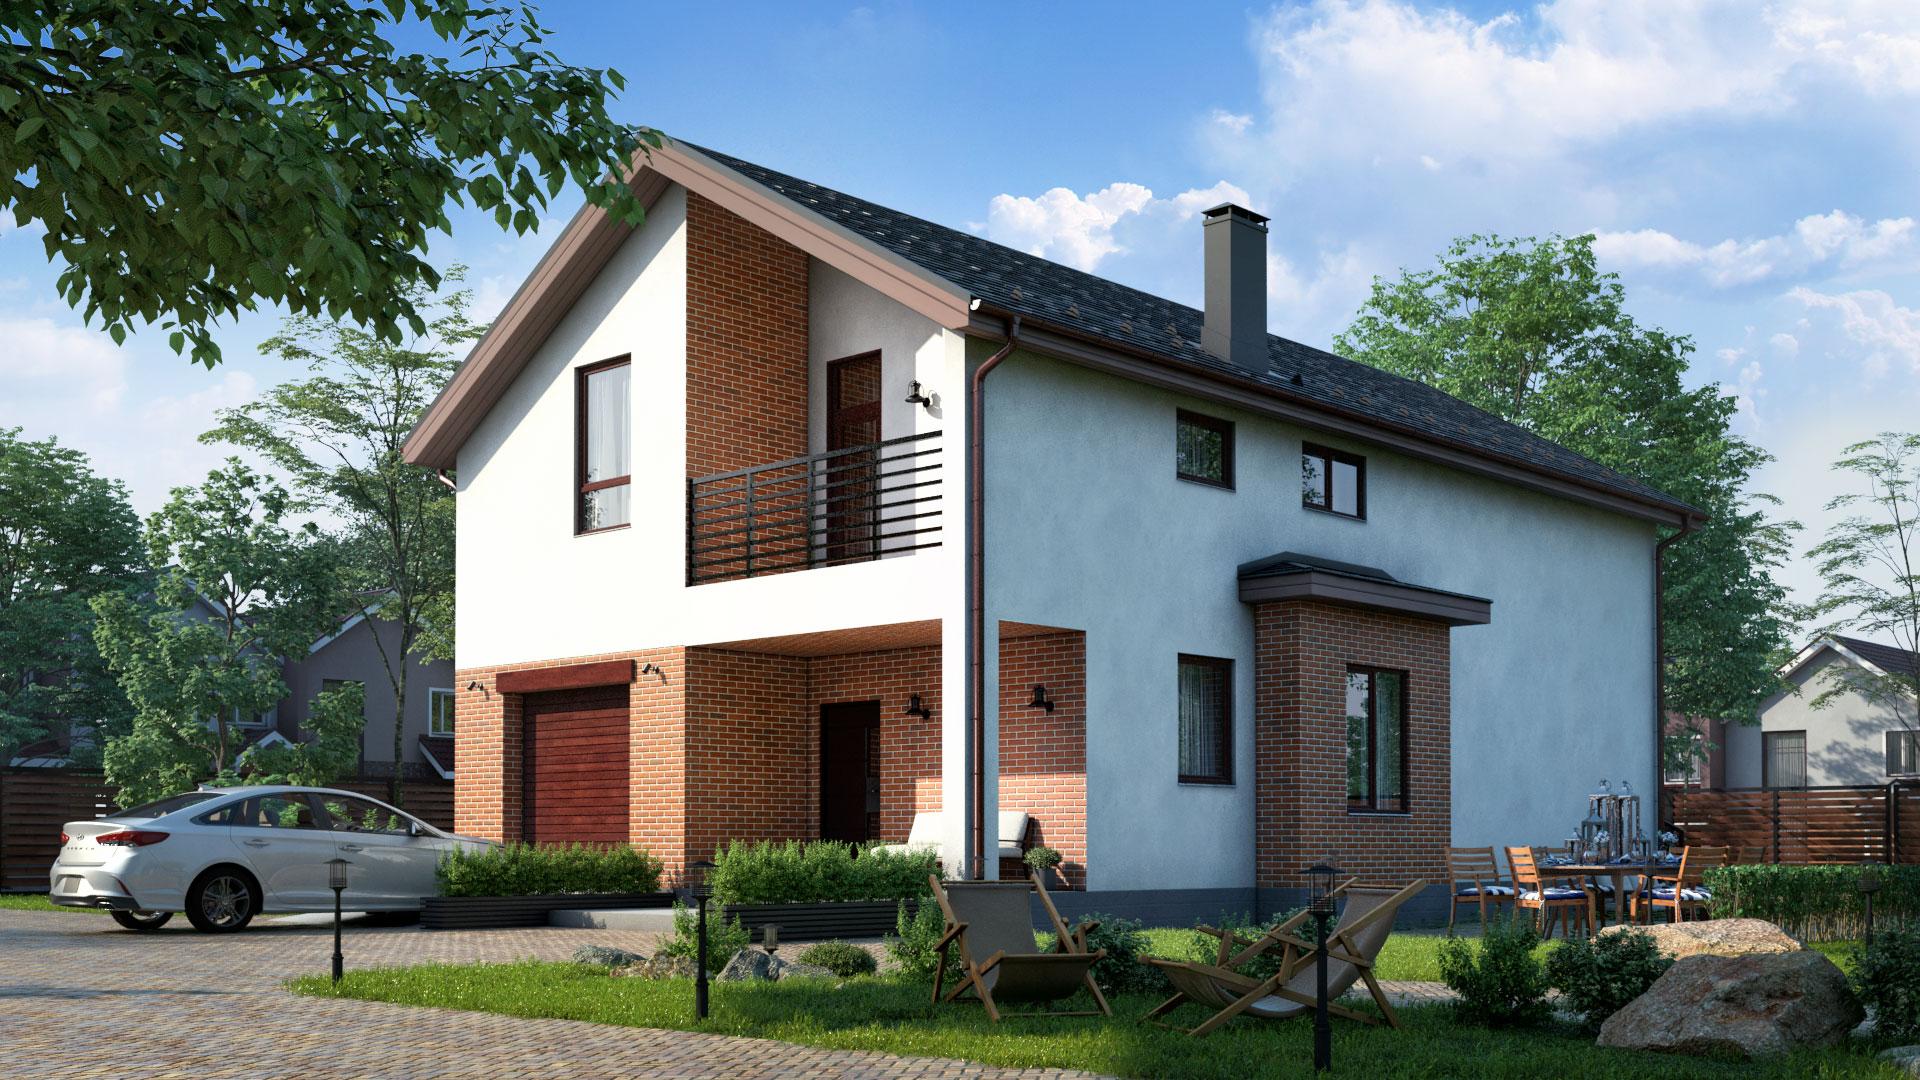 Передний фасад двухэтажного дома с террасой, 211,30 м2, проект БП-272/1.